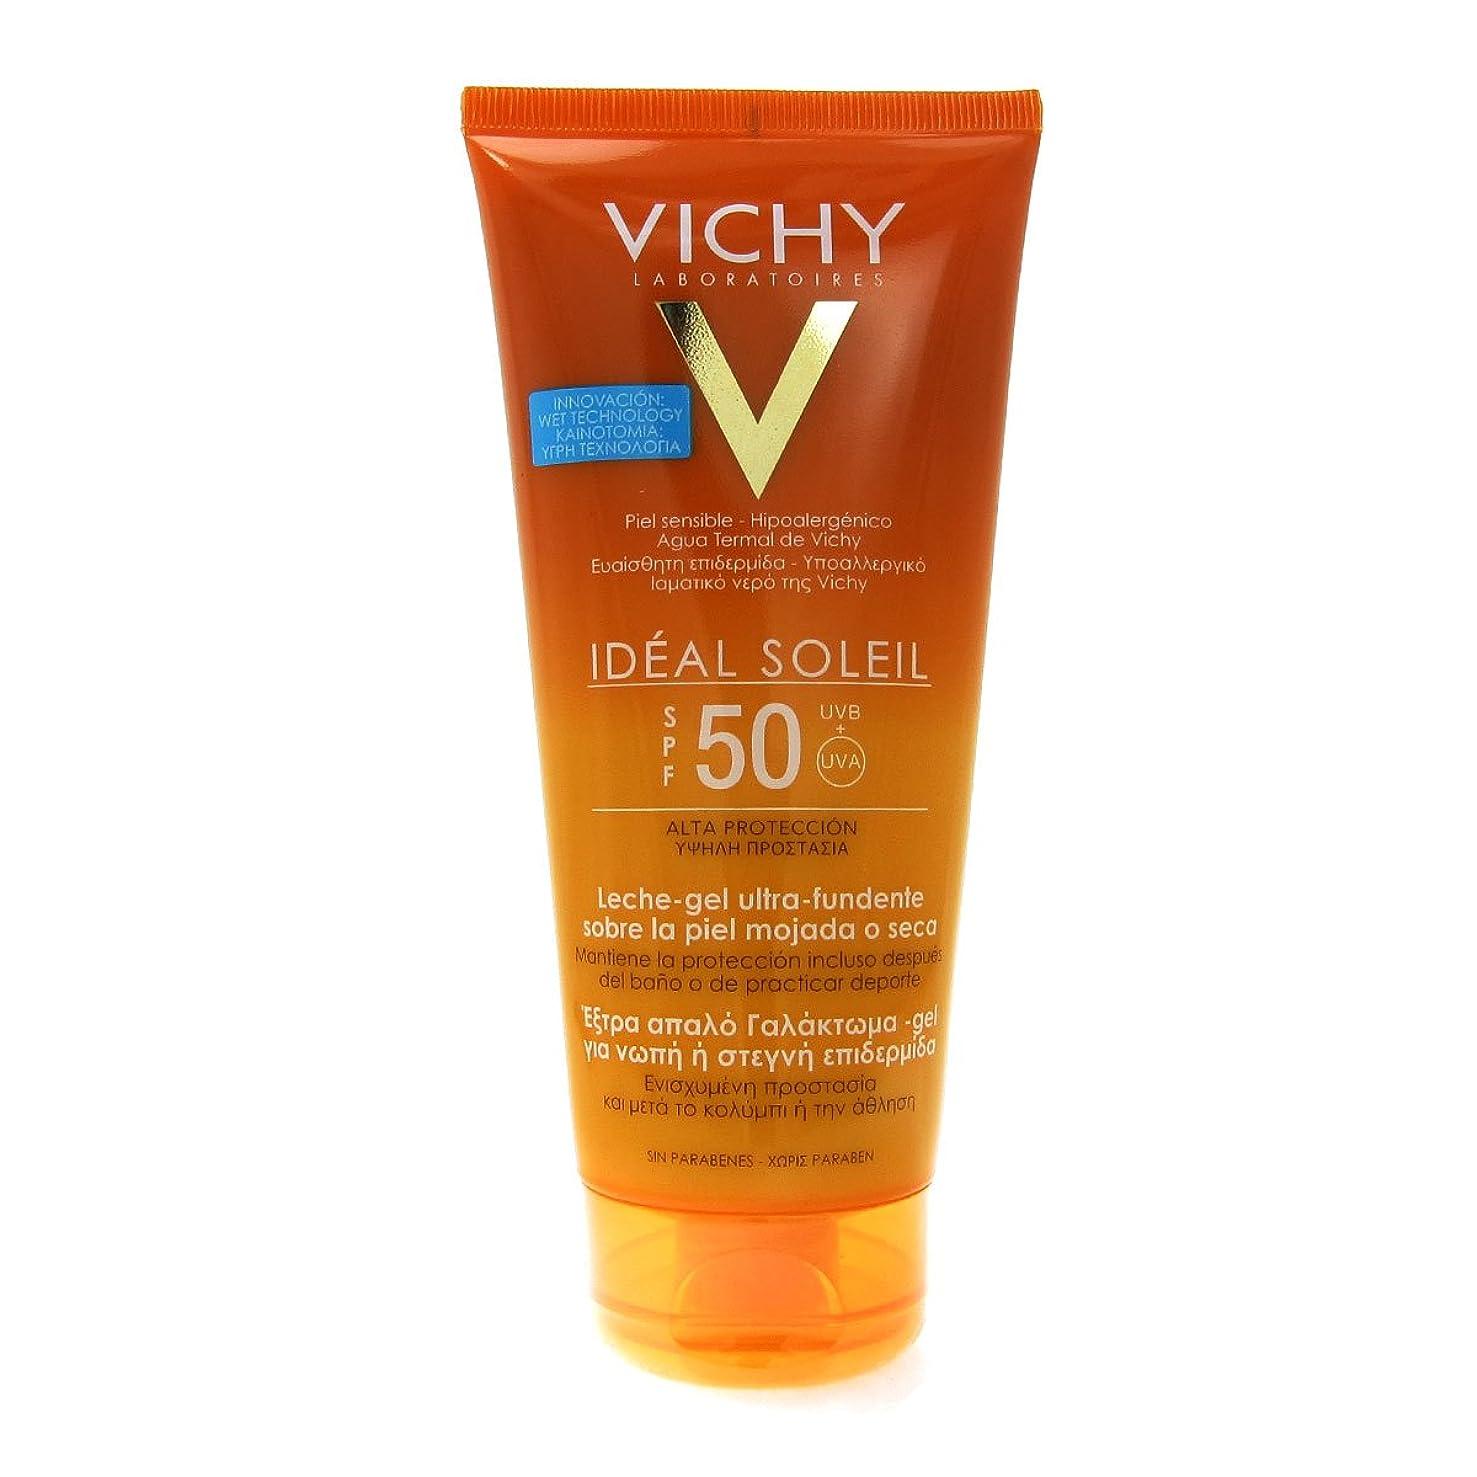 Vichy Capital Soleil Ideal Soleil Gel-cream Spf50 Face And Body 200ml [並行輸入品]